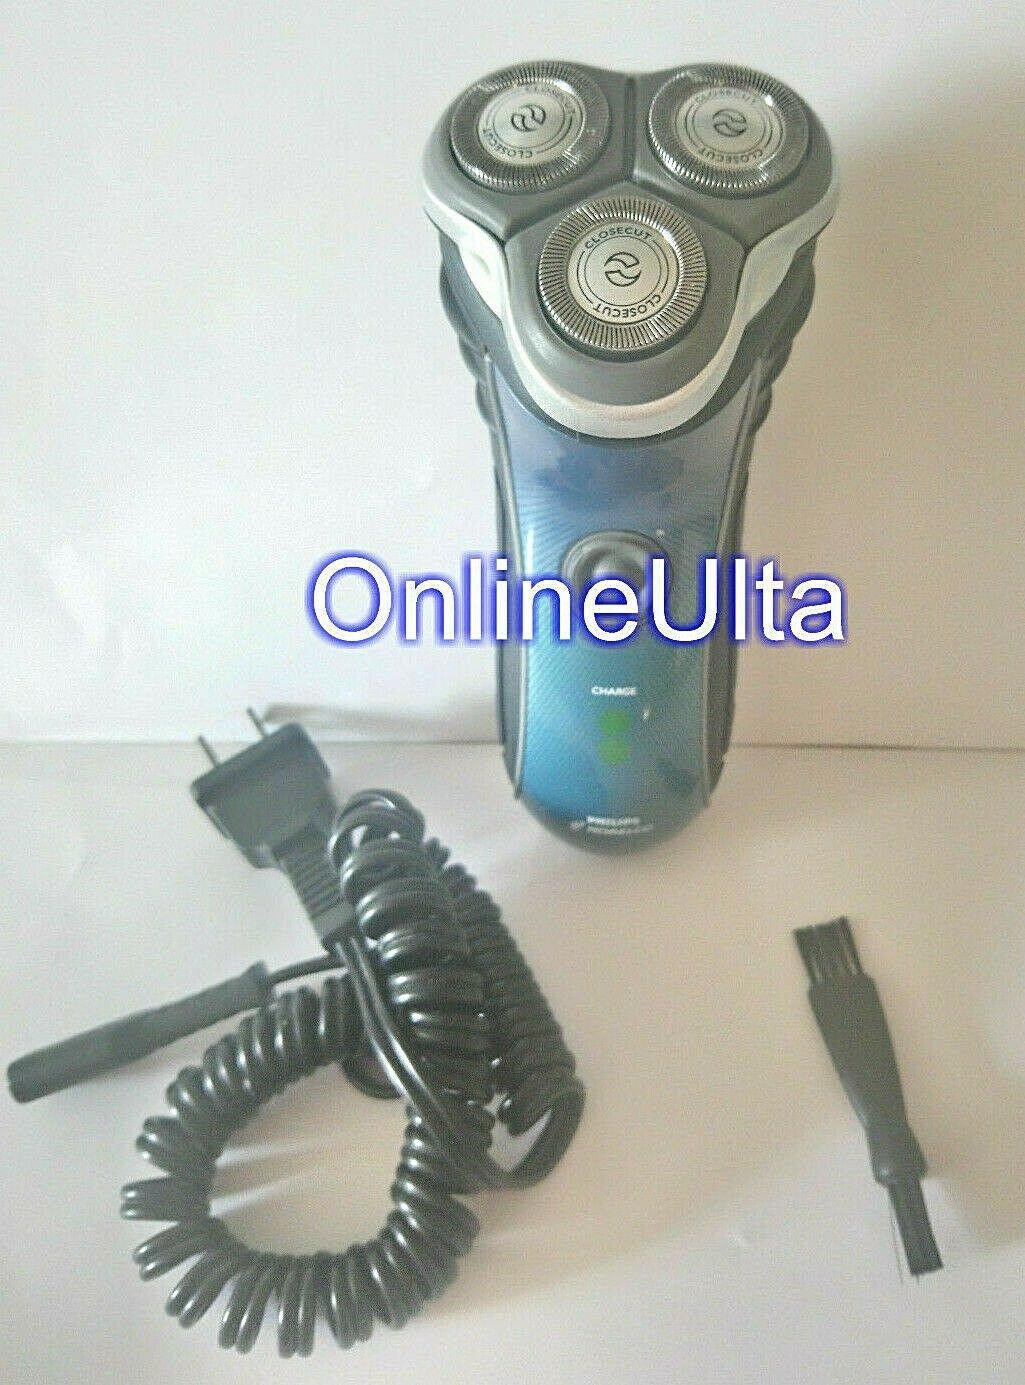 Philips Norelco 7340XL Quadra Action Men's Shaver trimmer corded Close cut